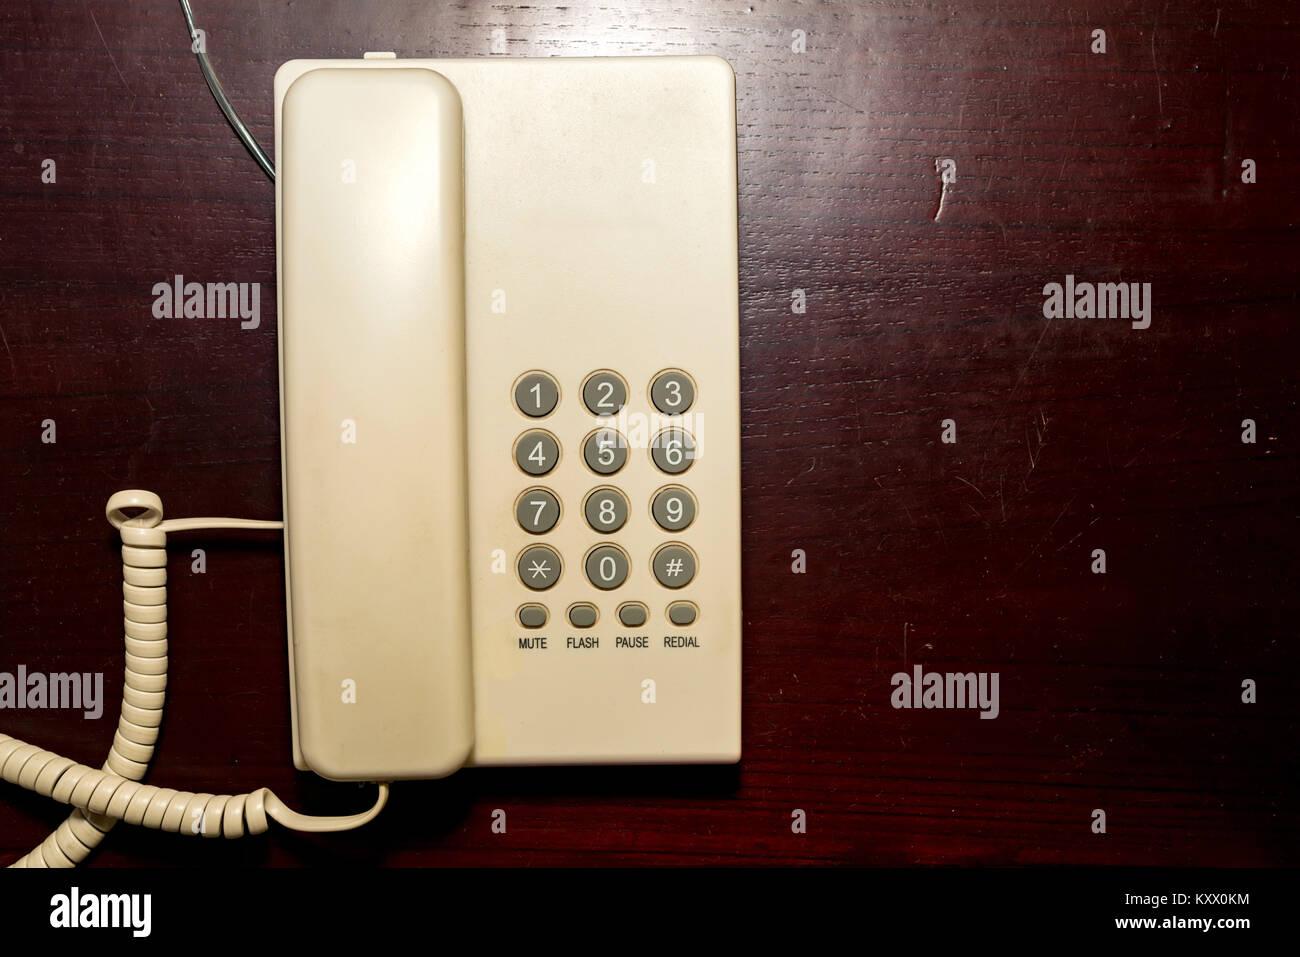 Top view white landline telephone on desk - Stock Image